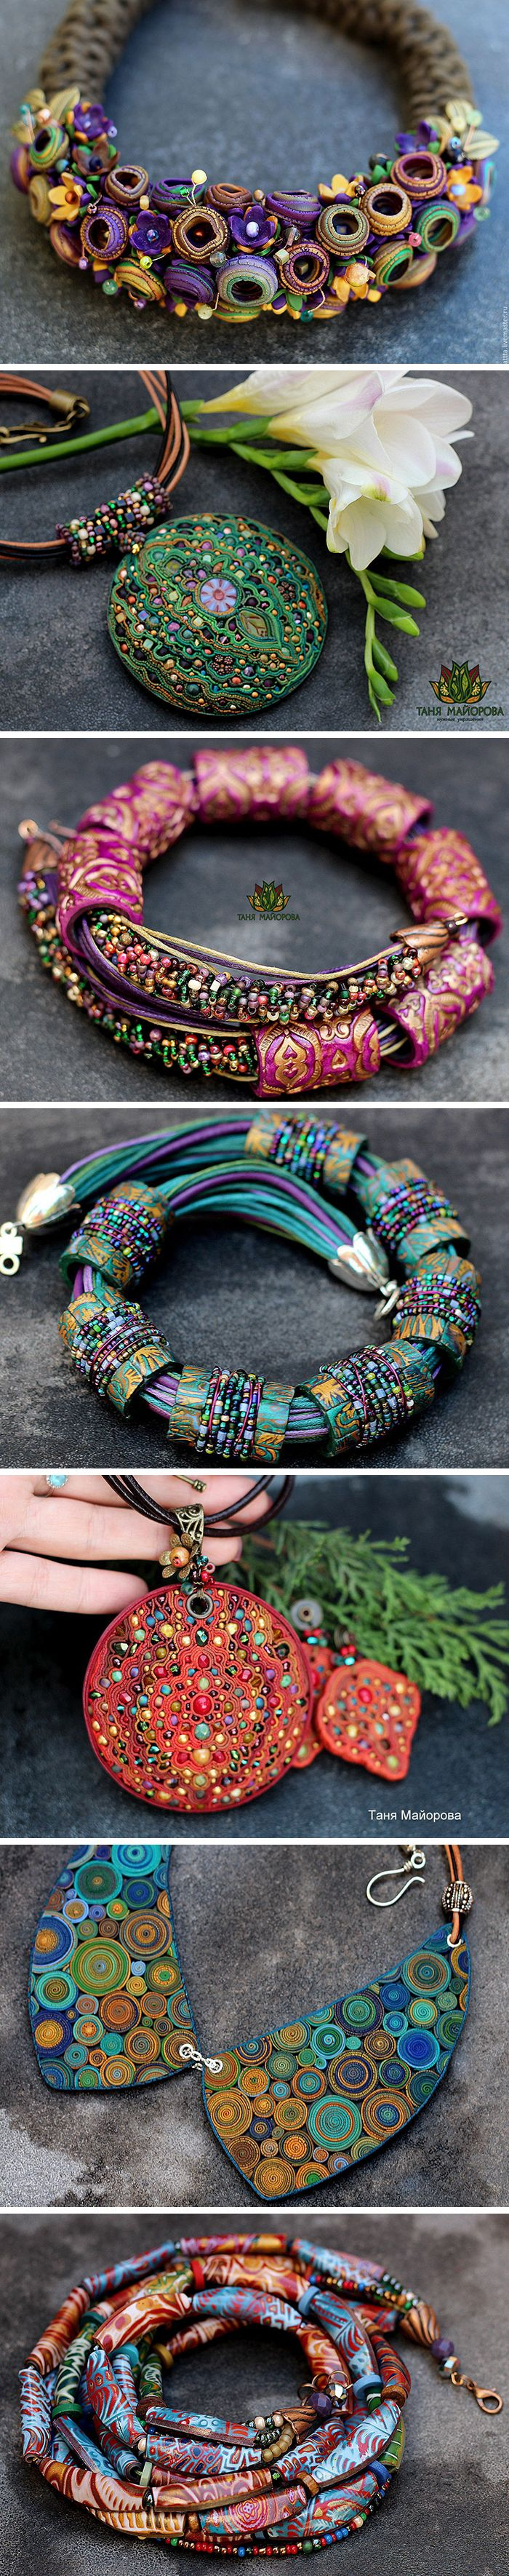 Tanya Mayorova creates magic jewelry with polymer clay